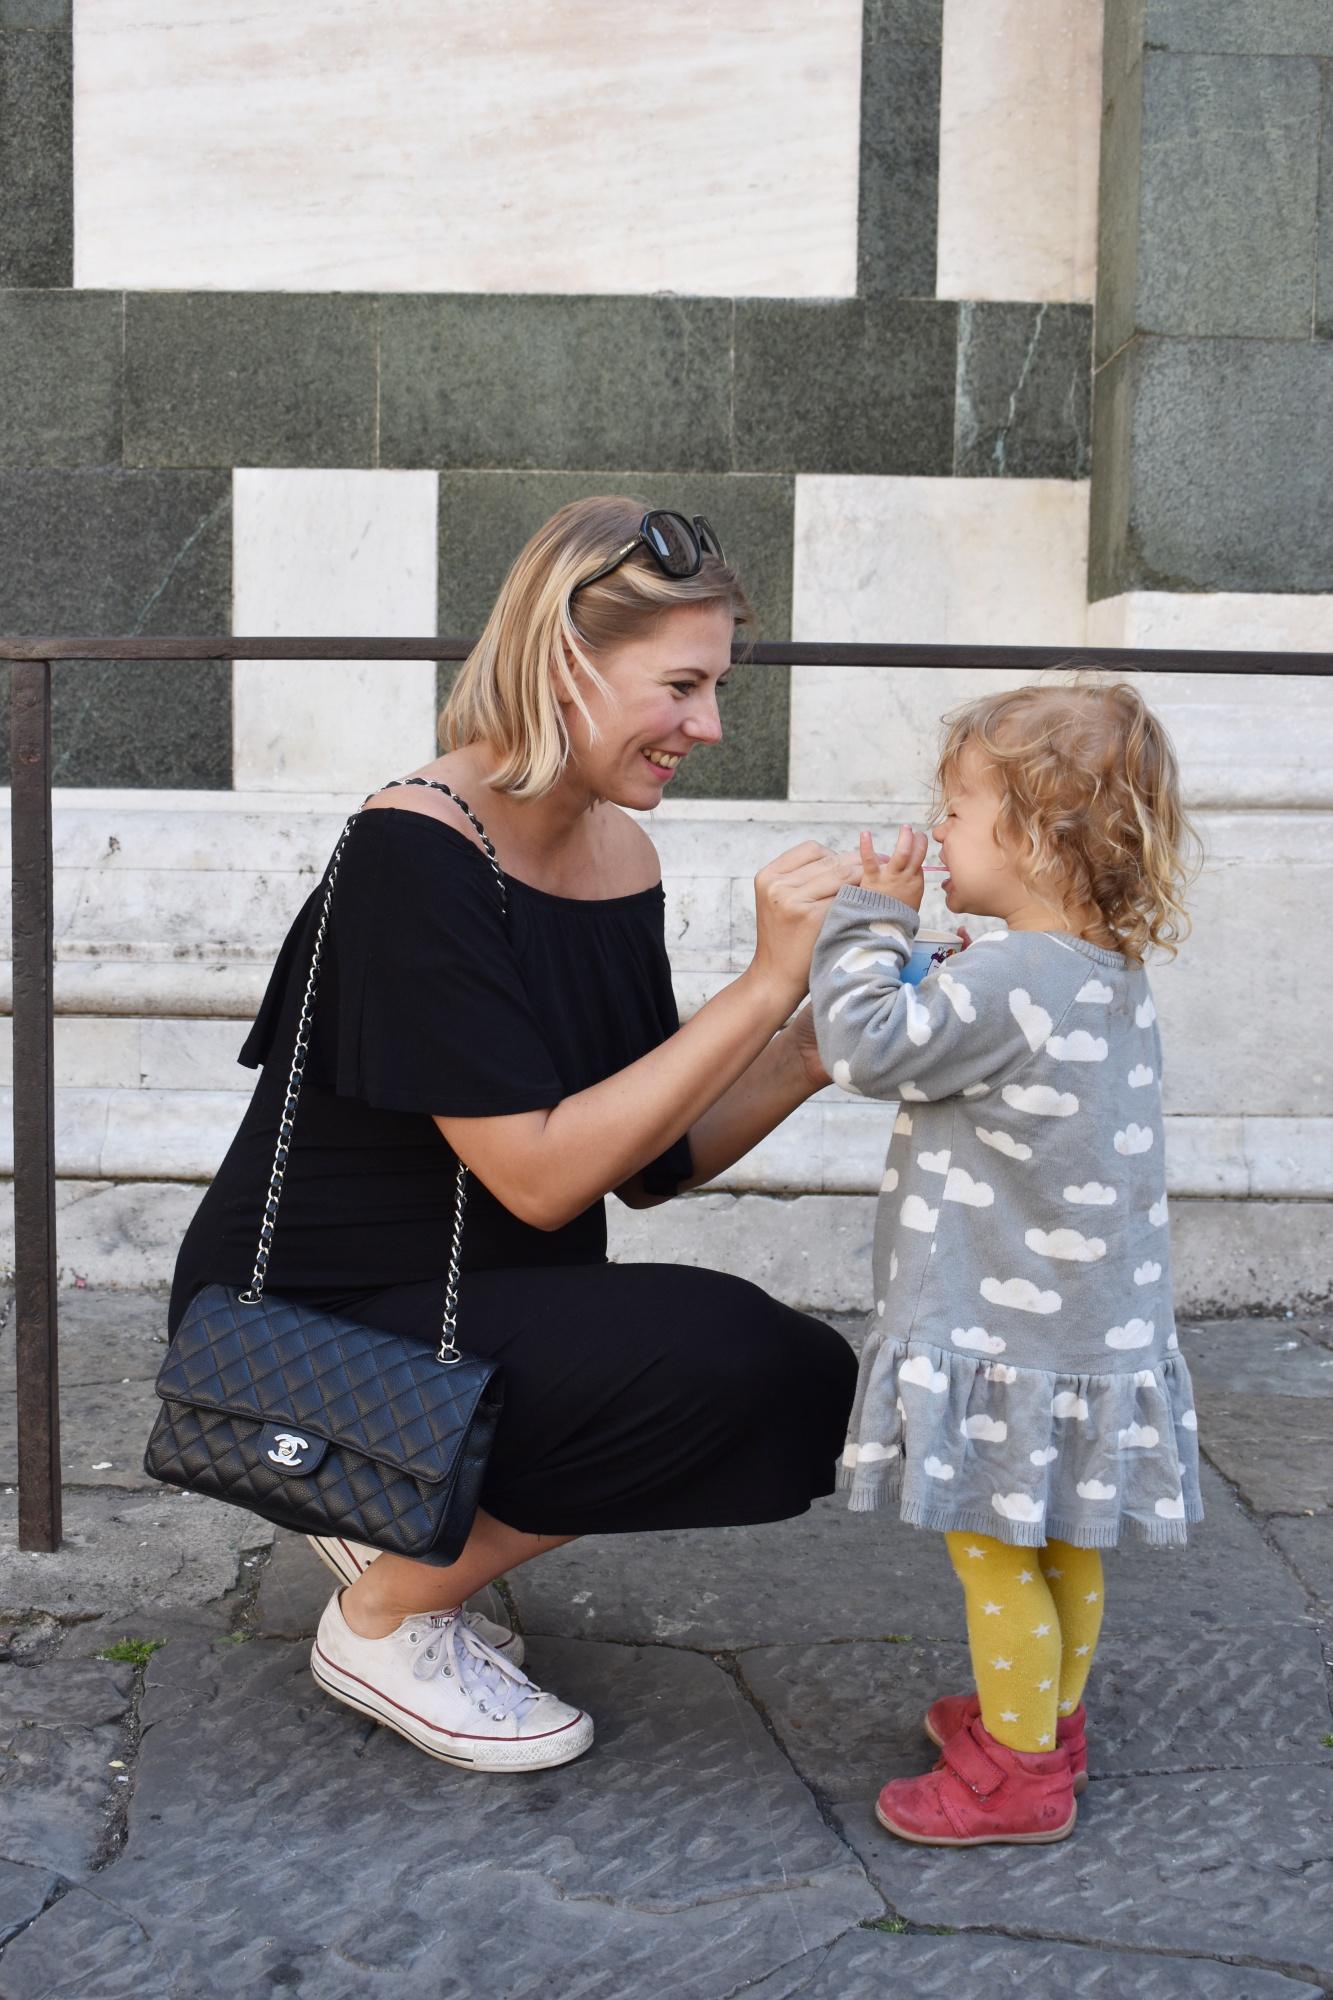 Asos Maternity, Umstandskleidung, Schwangerschaftskleidung,